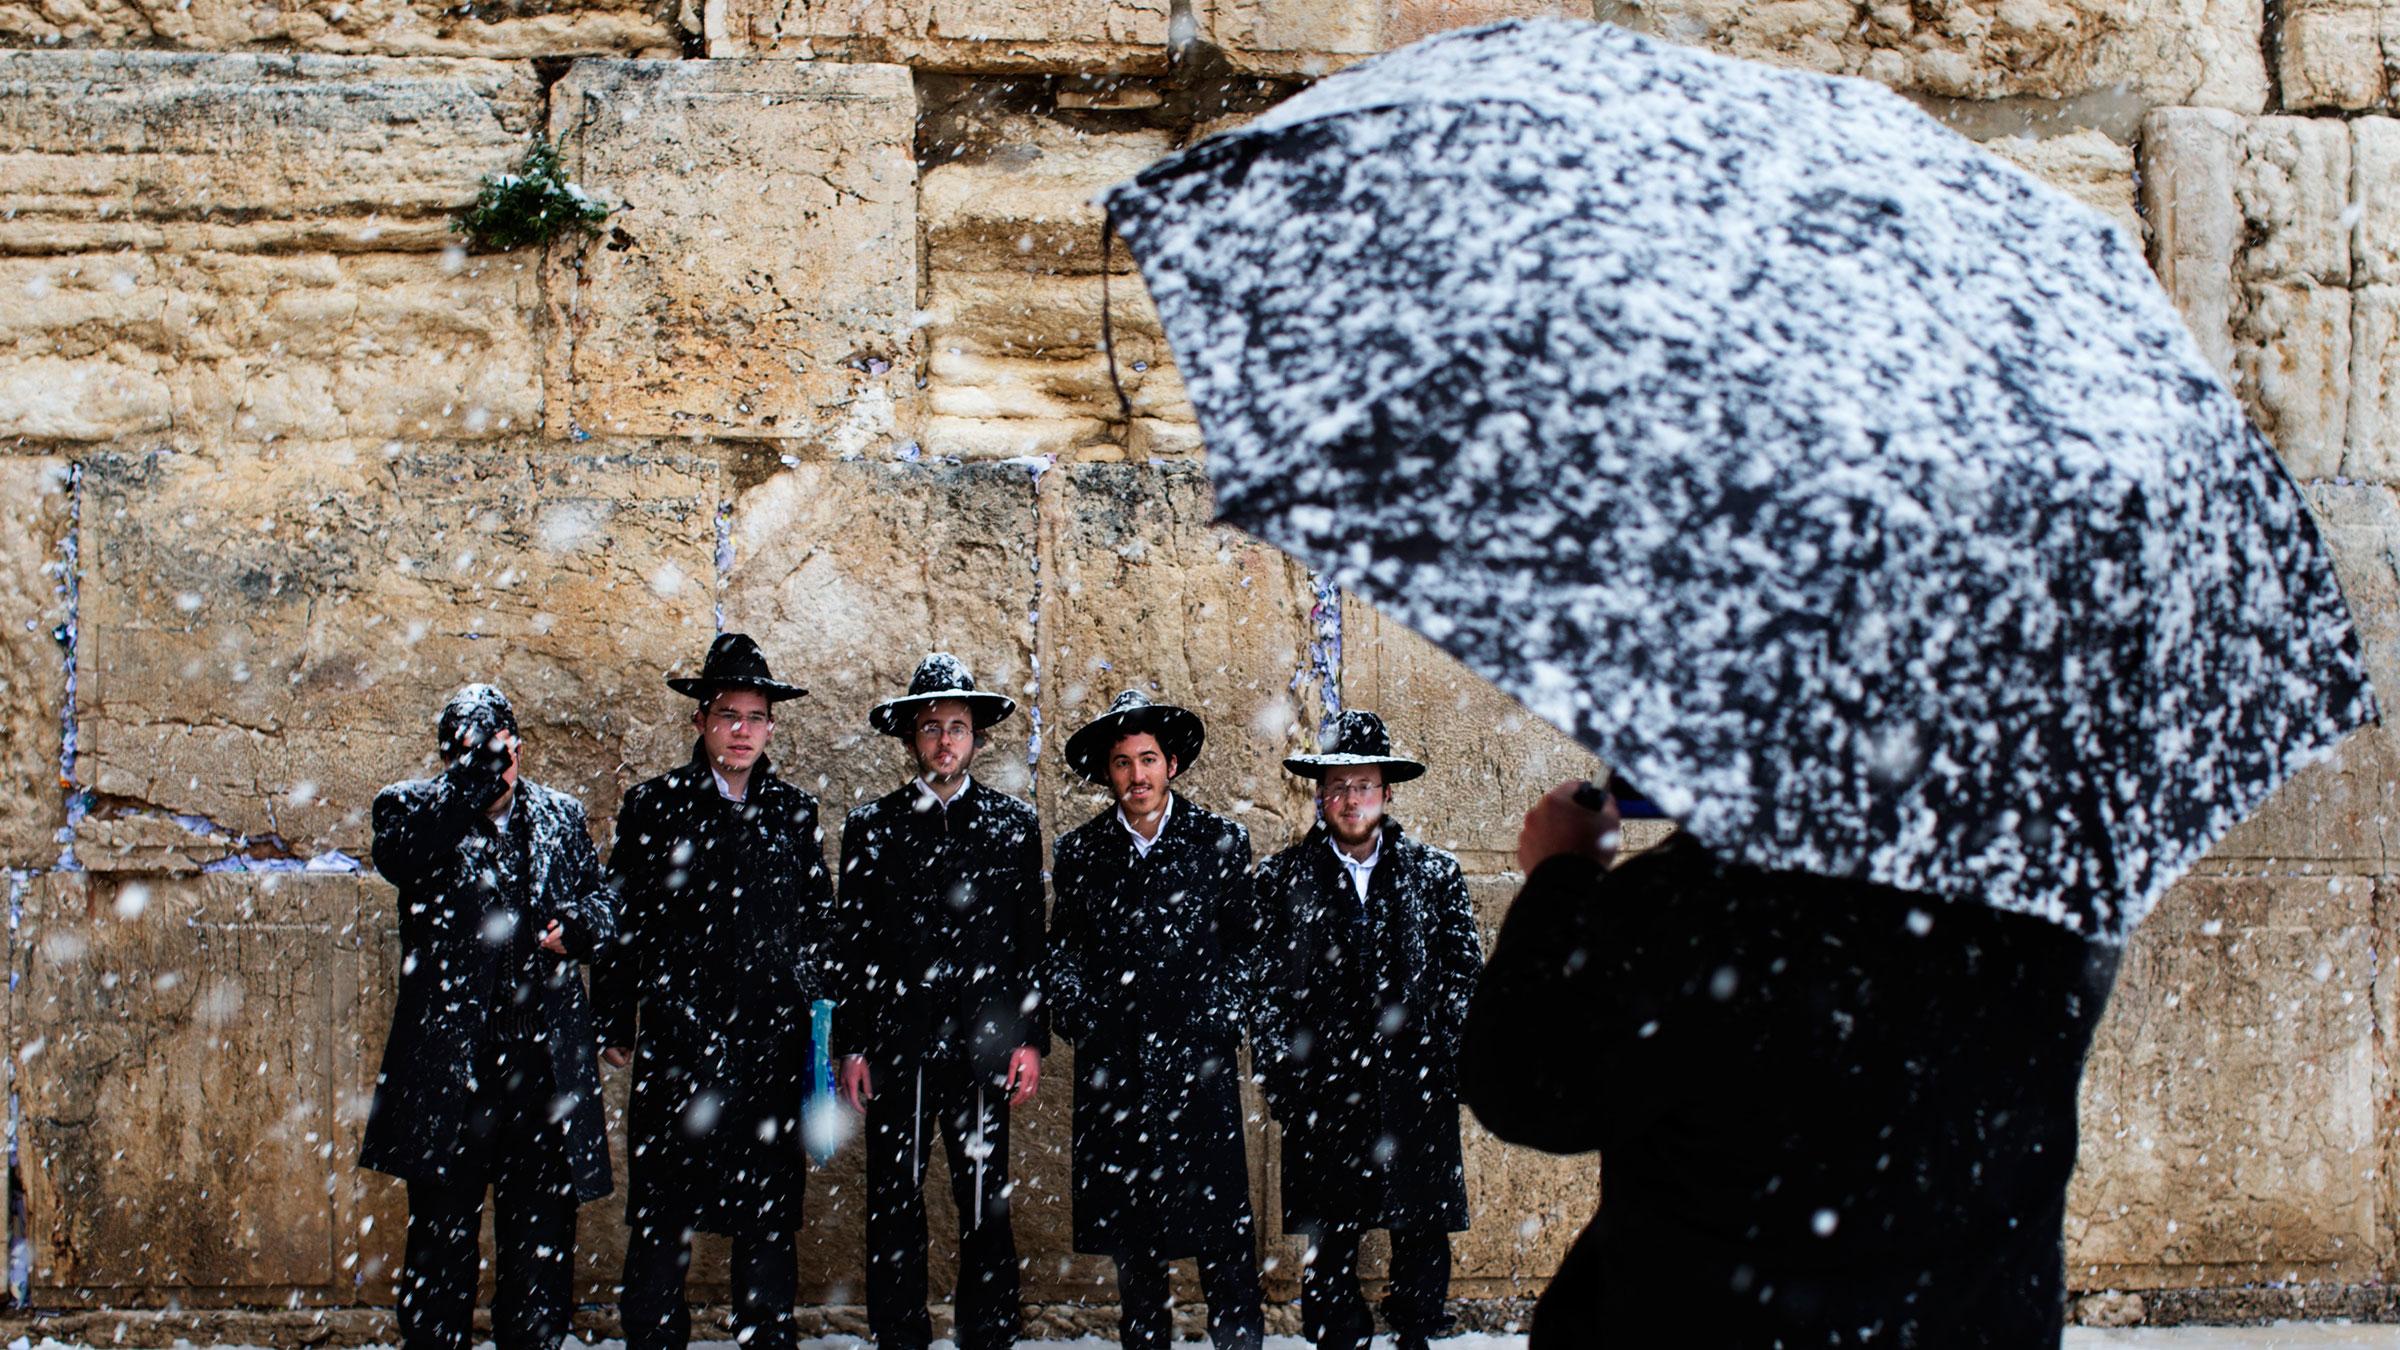 Israel, snowfall